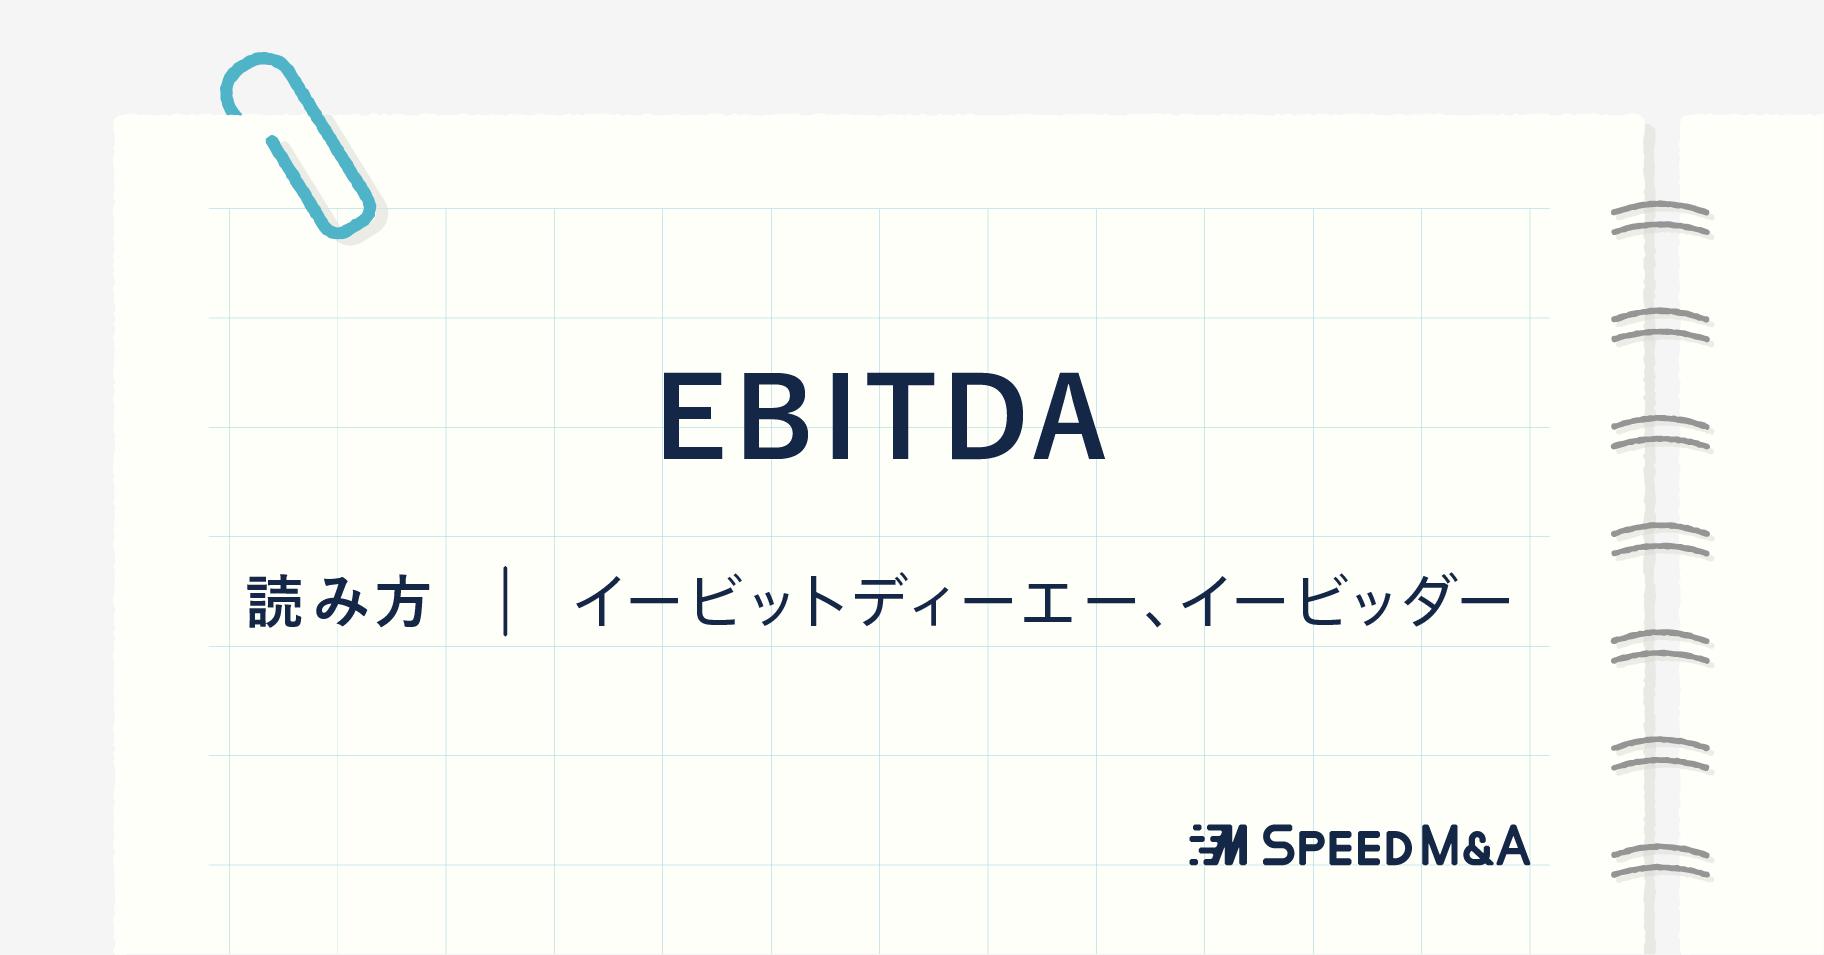 EBITDAとは